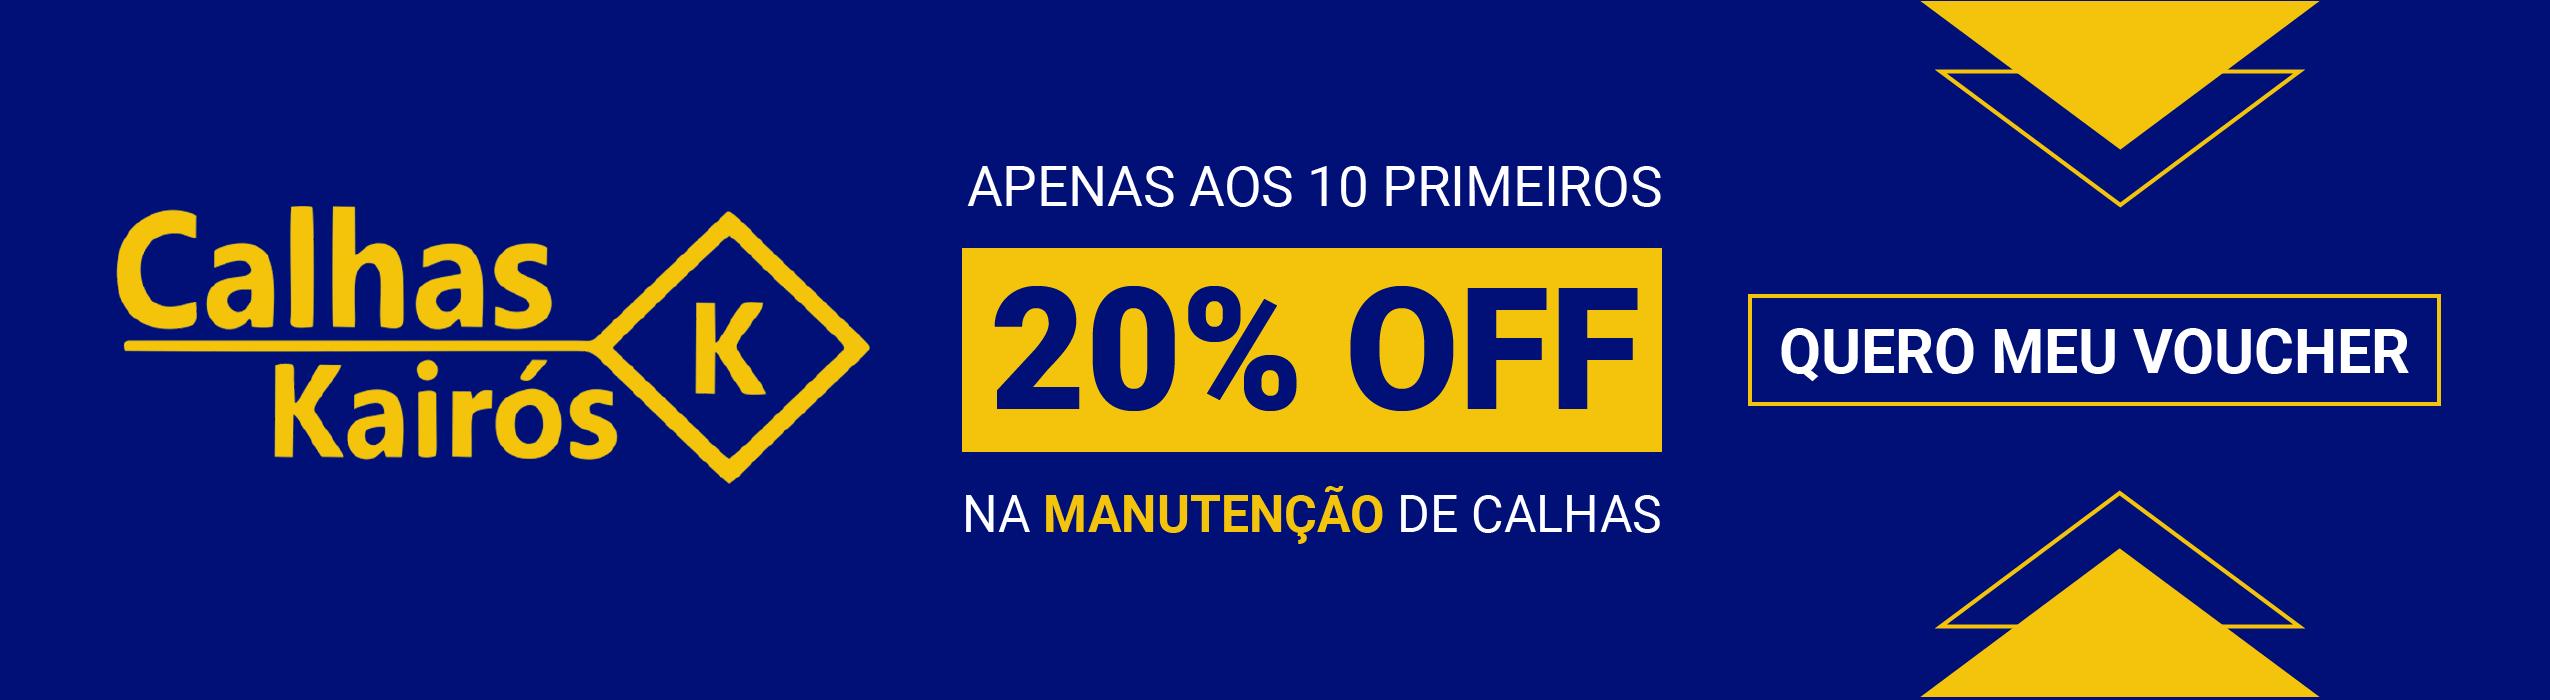 CALHAS KAIRÓS